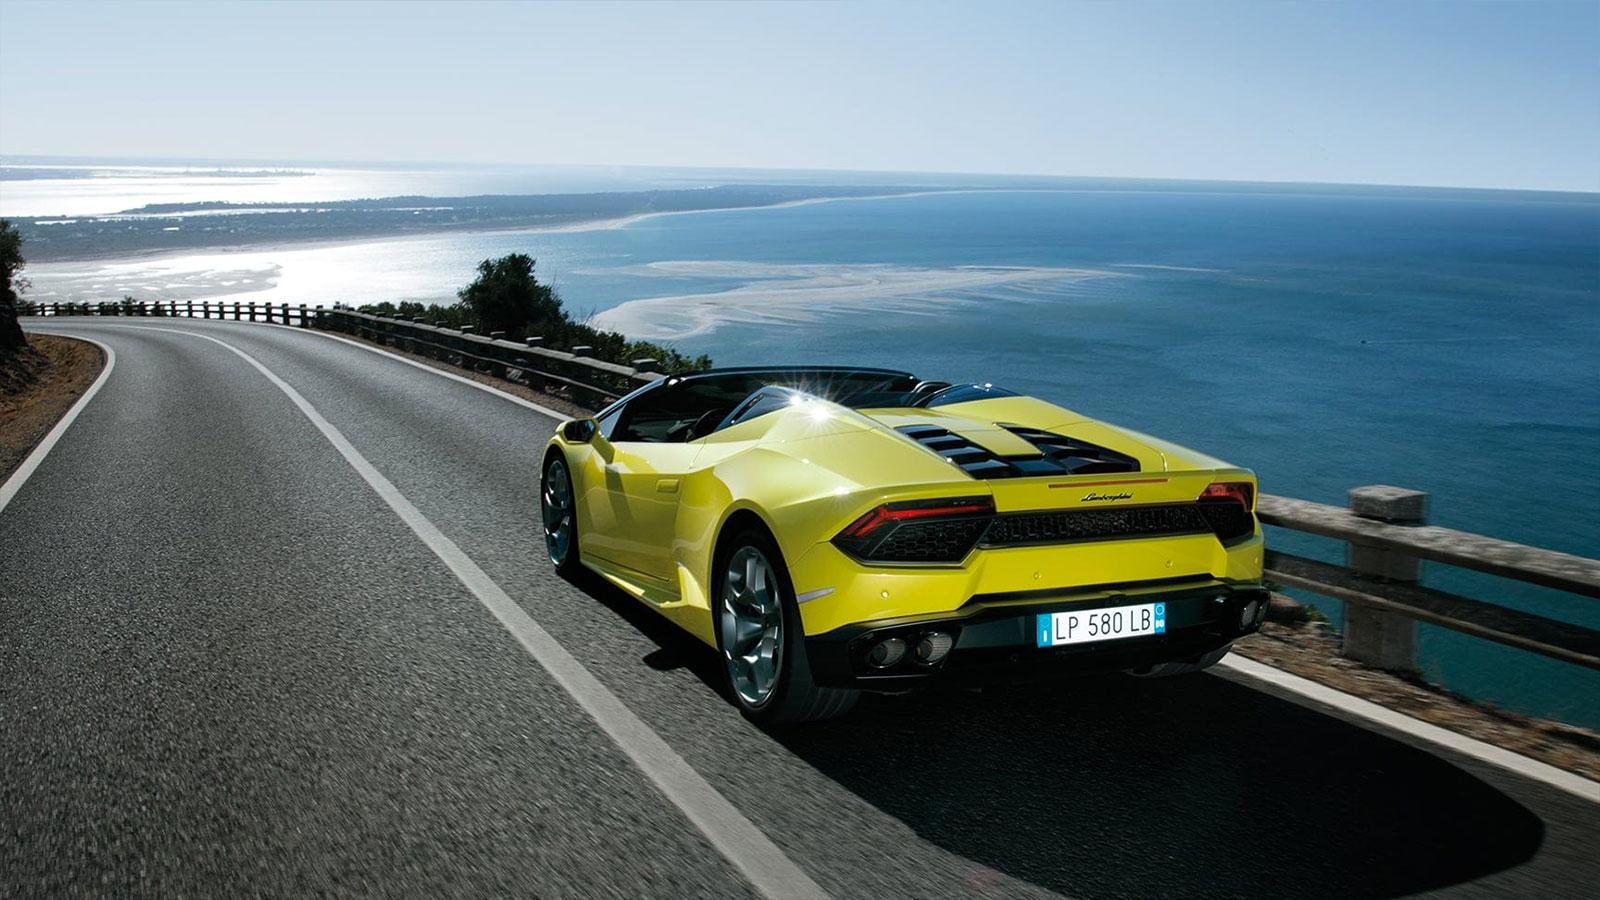 Lamborghini Huracan RWD Spyder - Breathtaking Technology image 4